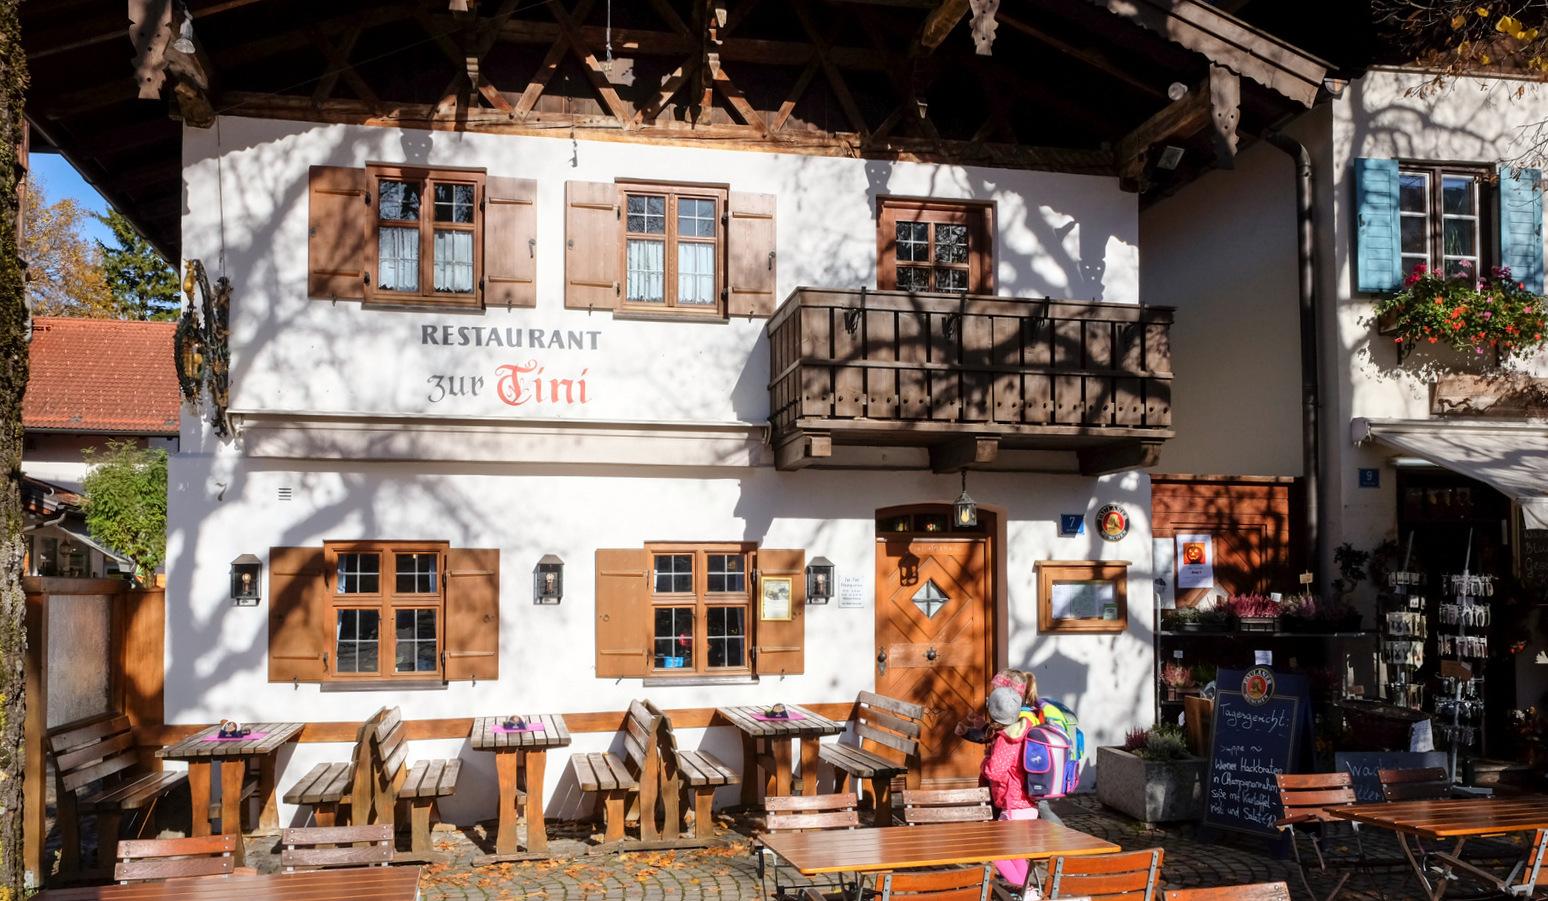 Zur Tini @ Oberammergau, Germany